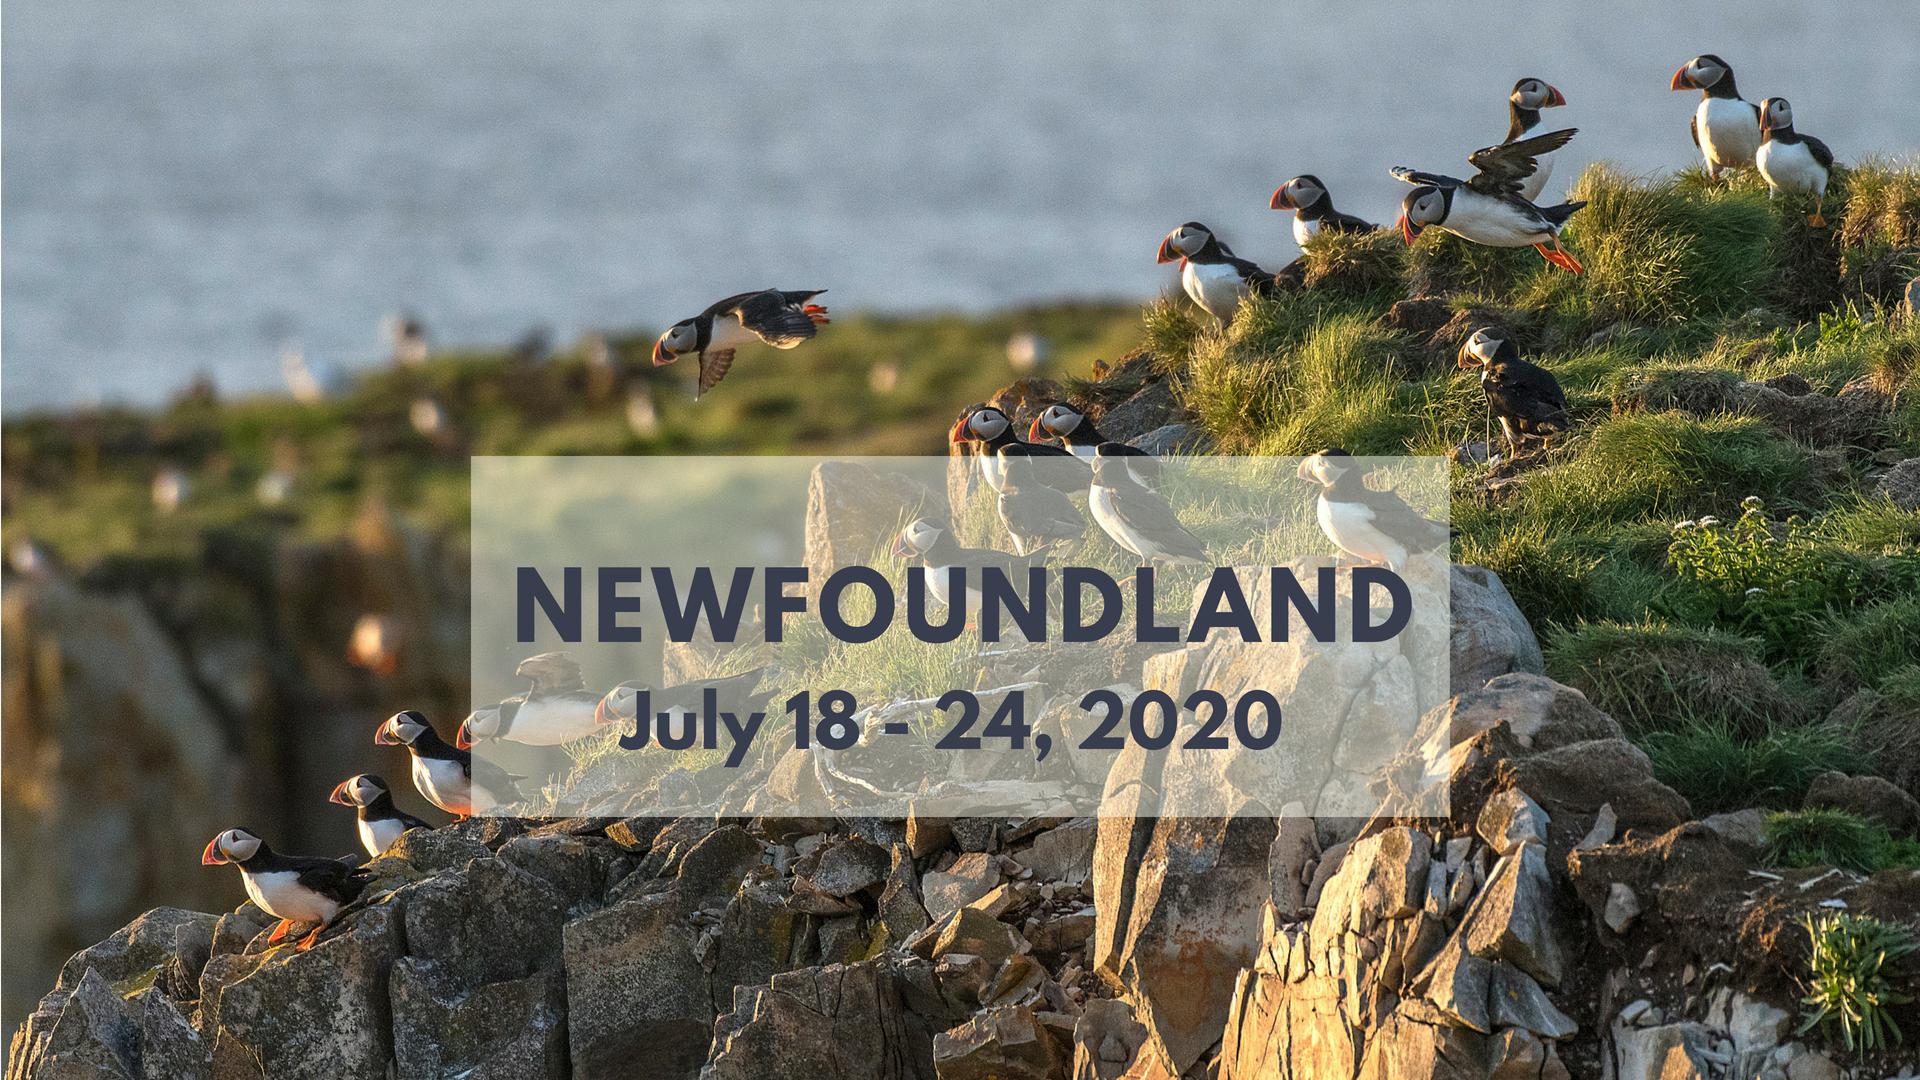 Newfoundland Photography Workshop 2020